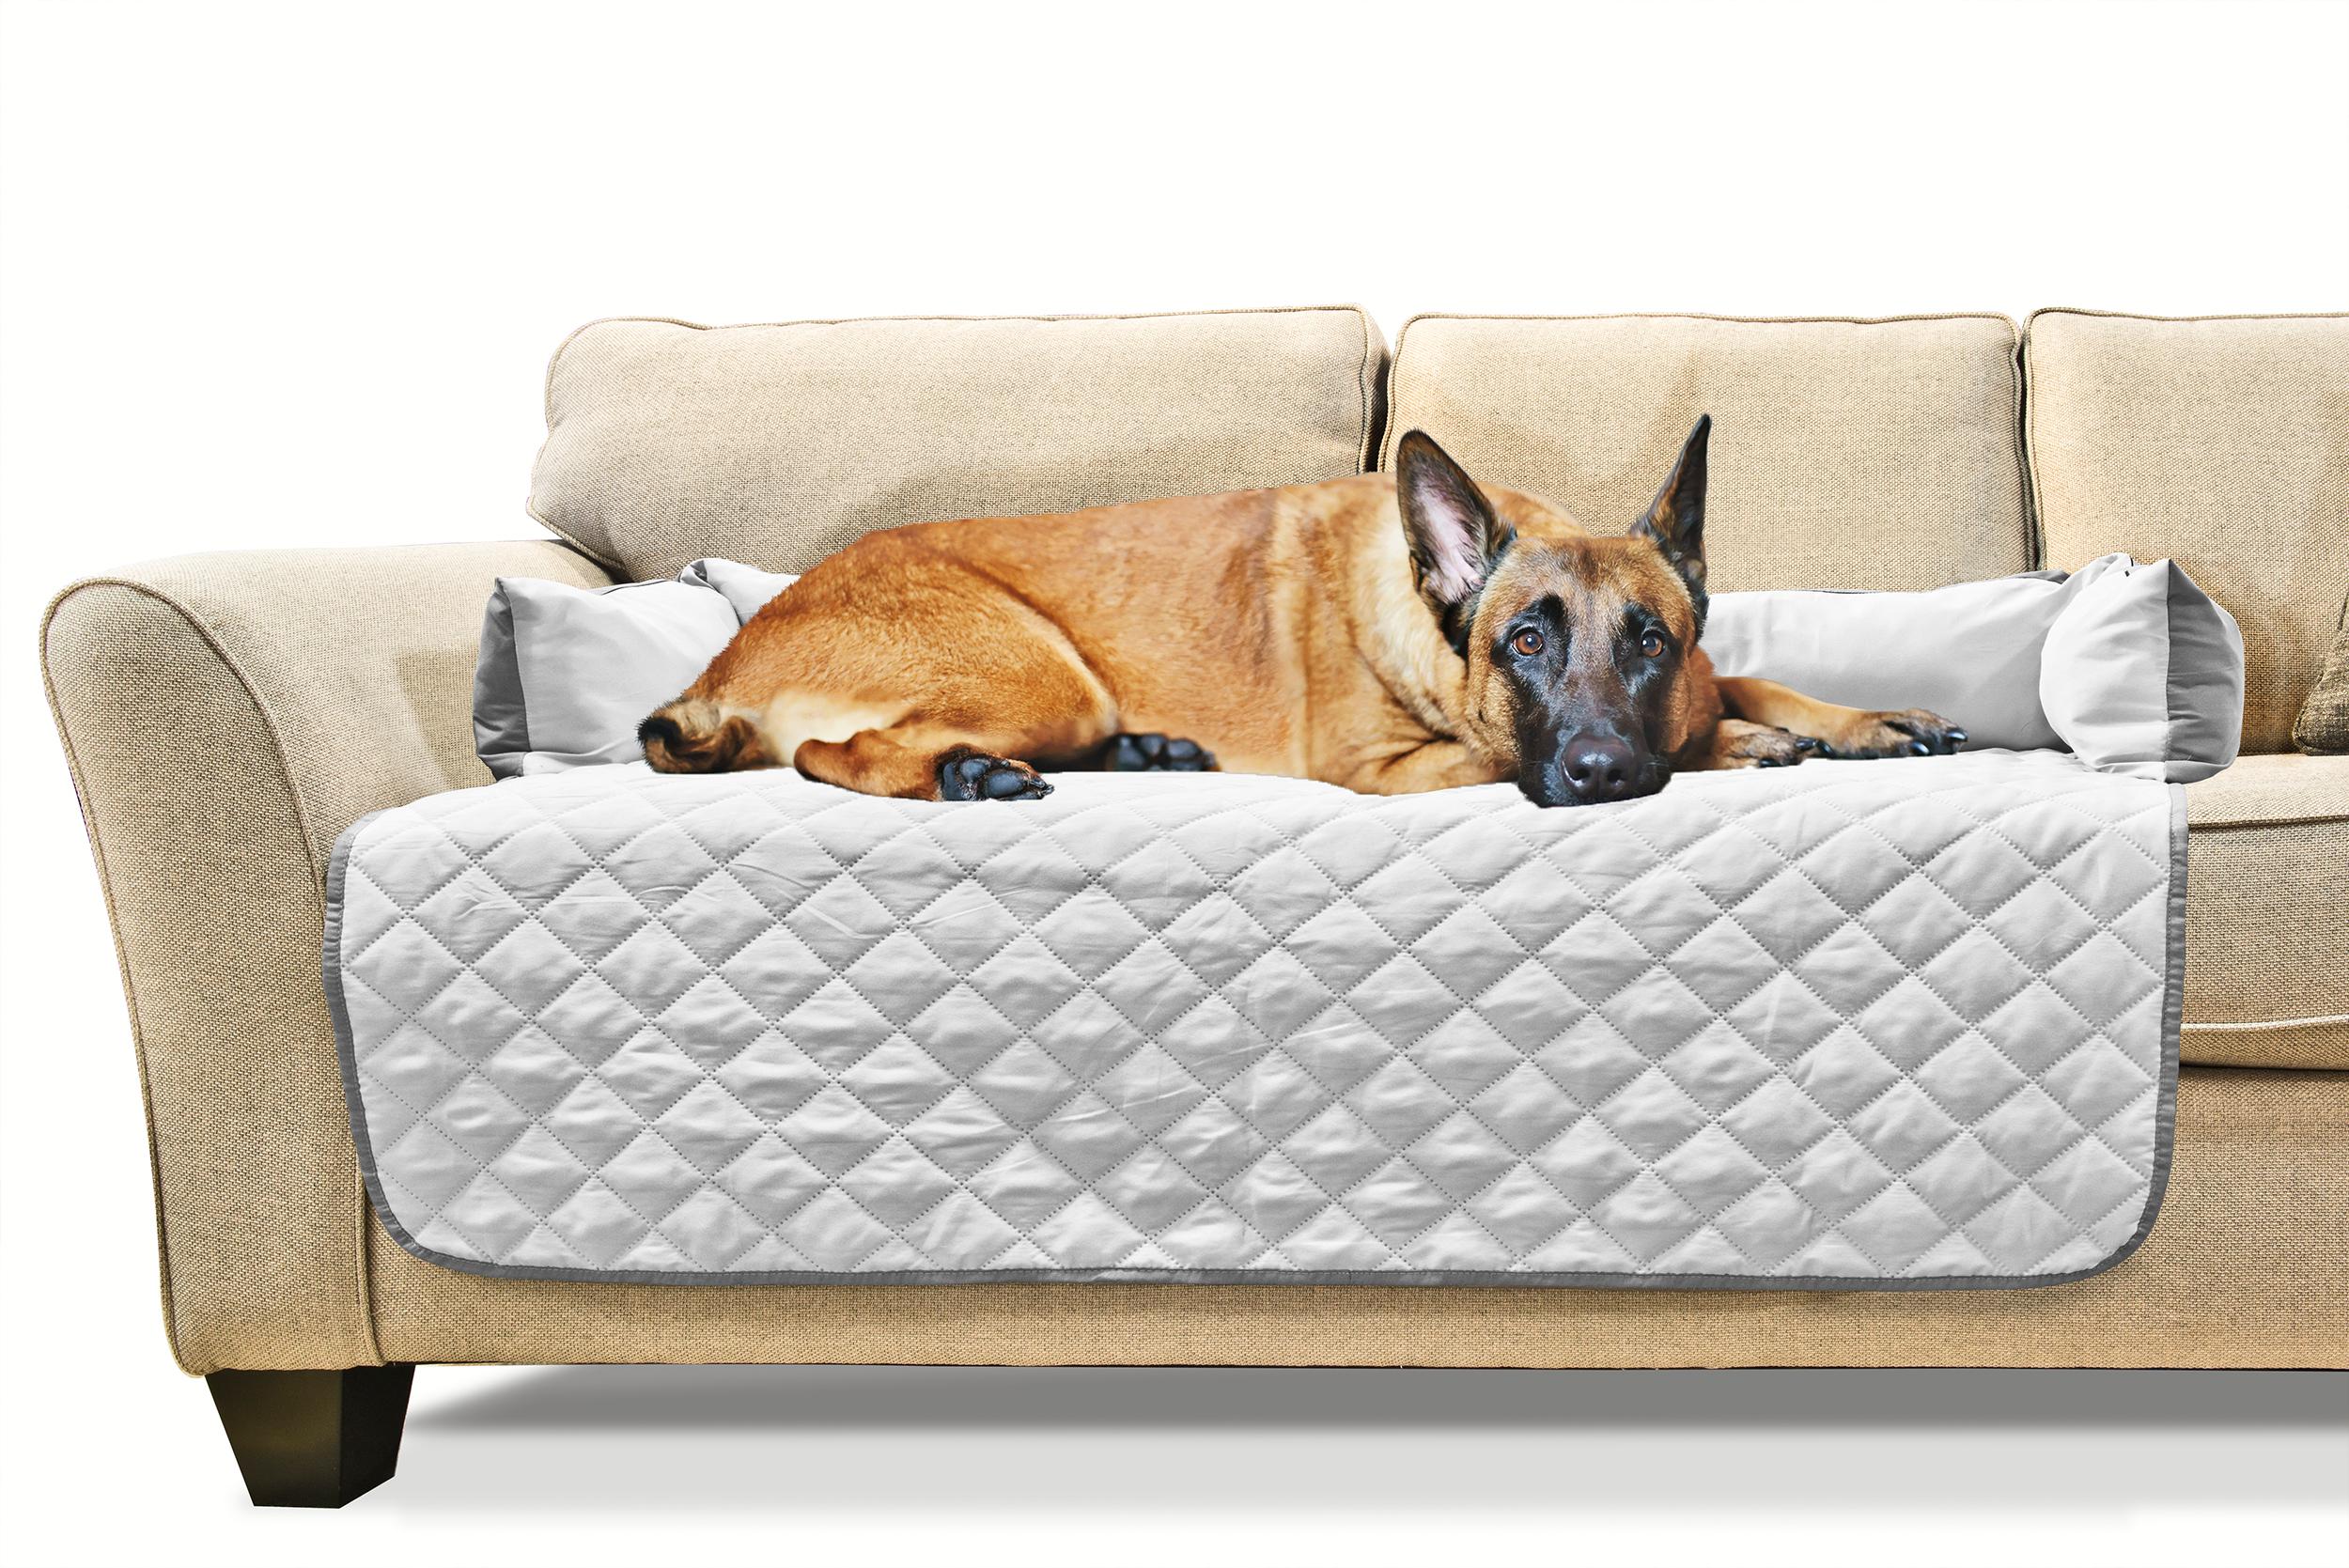 Furhaven Sofa Buddy Pet Bed Furniture Cover Ebay